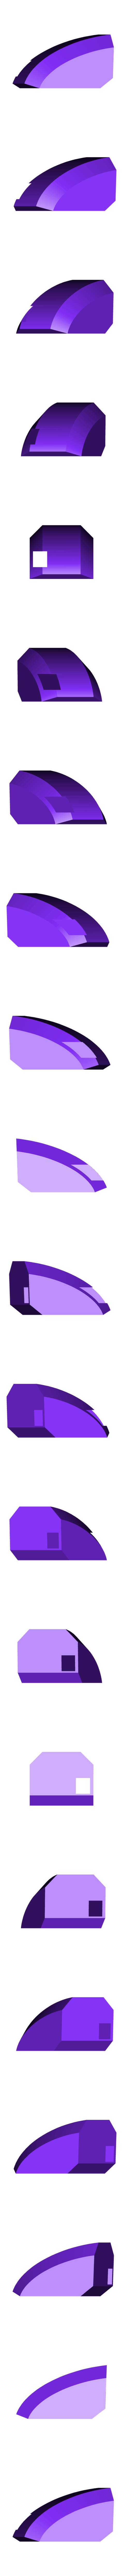 1._Helicopter_Cockpit_Window.STL Télécharger fichier STL gratuit Multi-Color Flying Helicopter Toy • Plan à imprimer en 3D, MosaicManufacturing